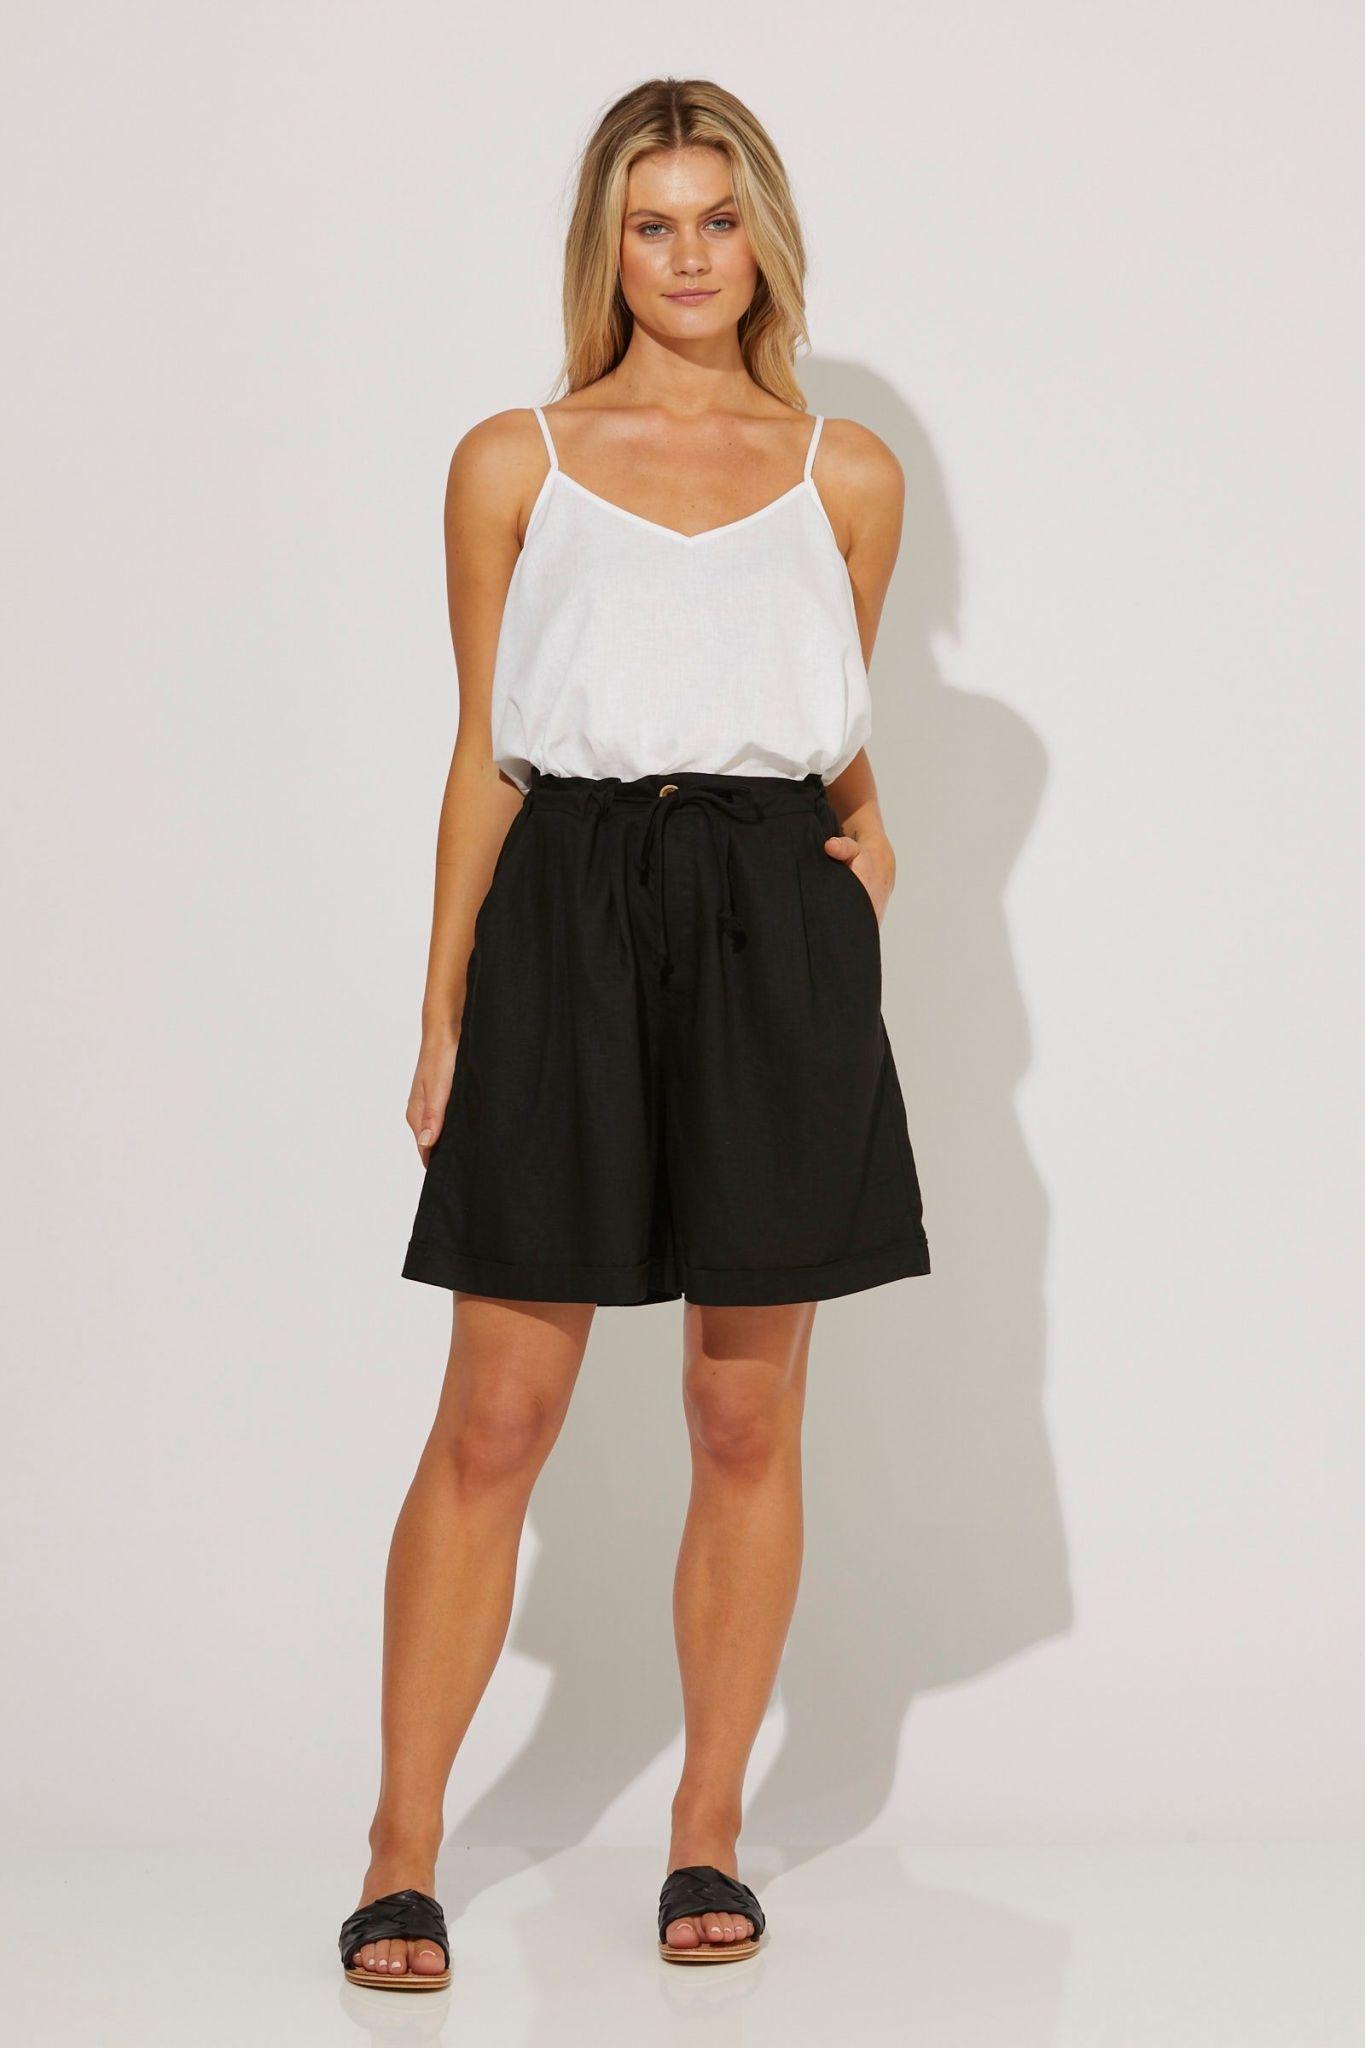 Haven Nevis Bermuda Short Black